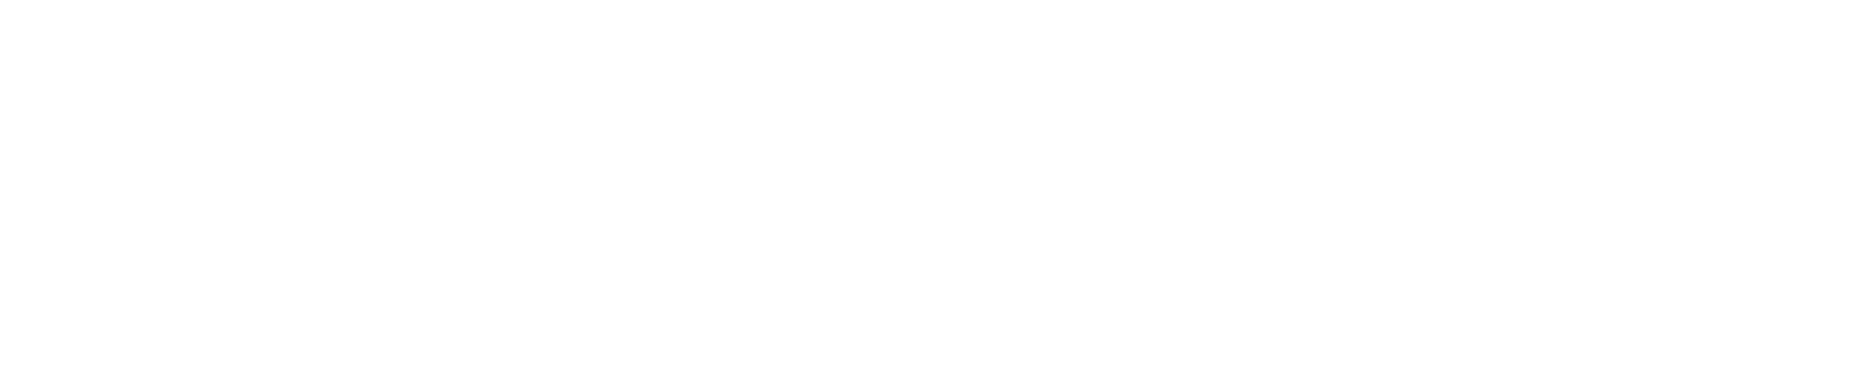 Emory LITS logo